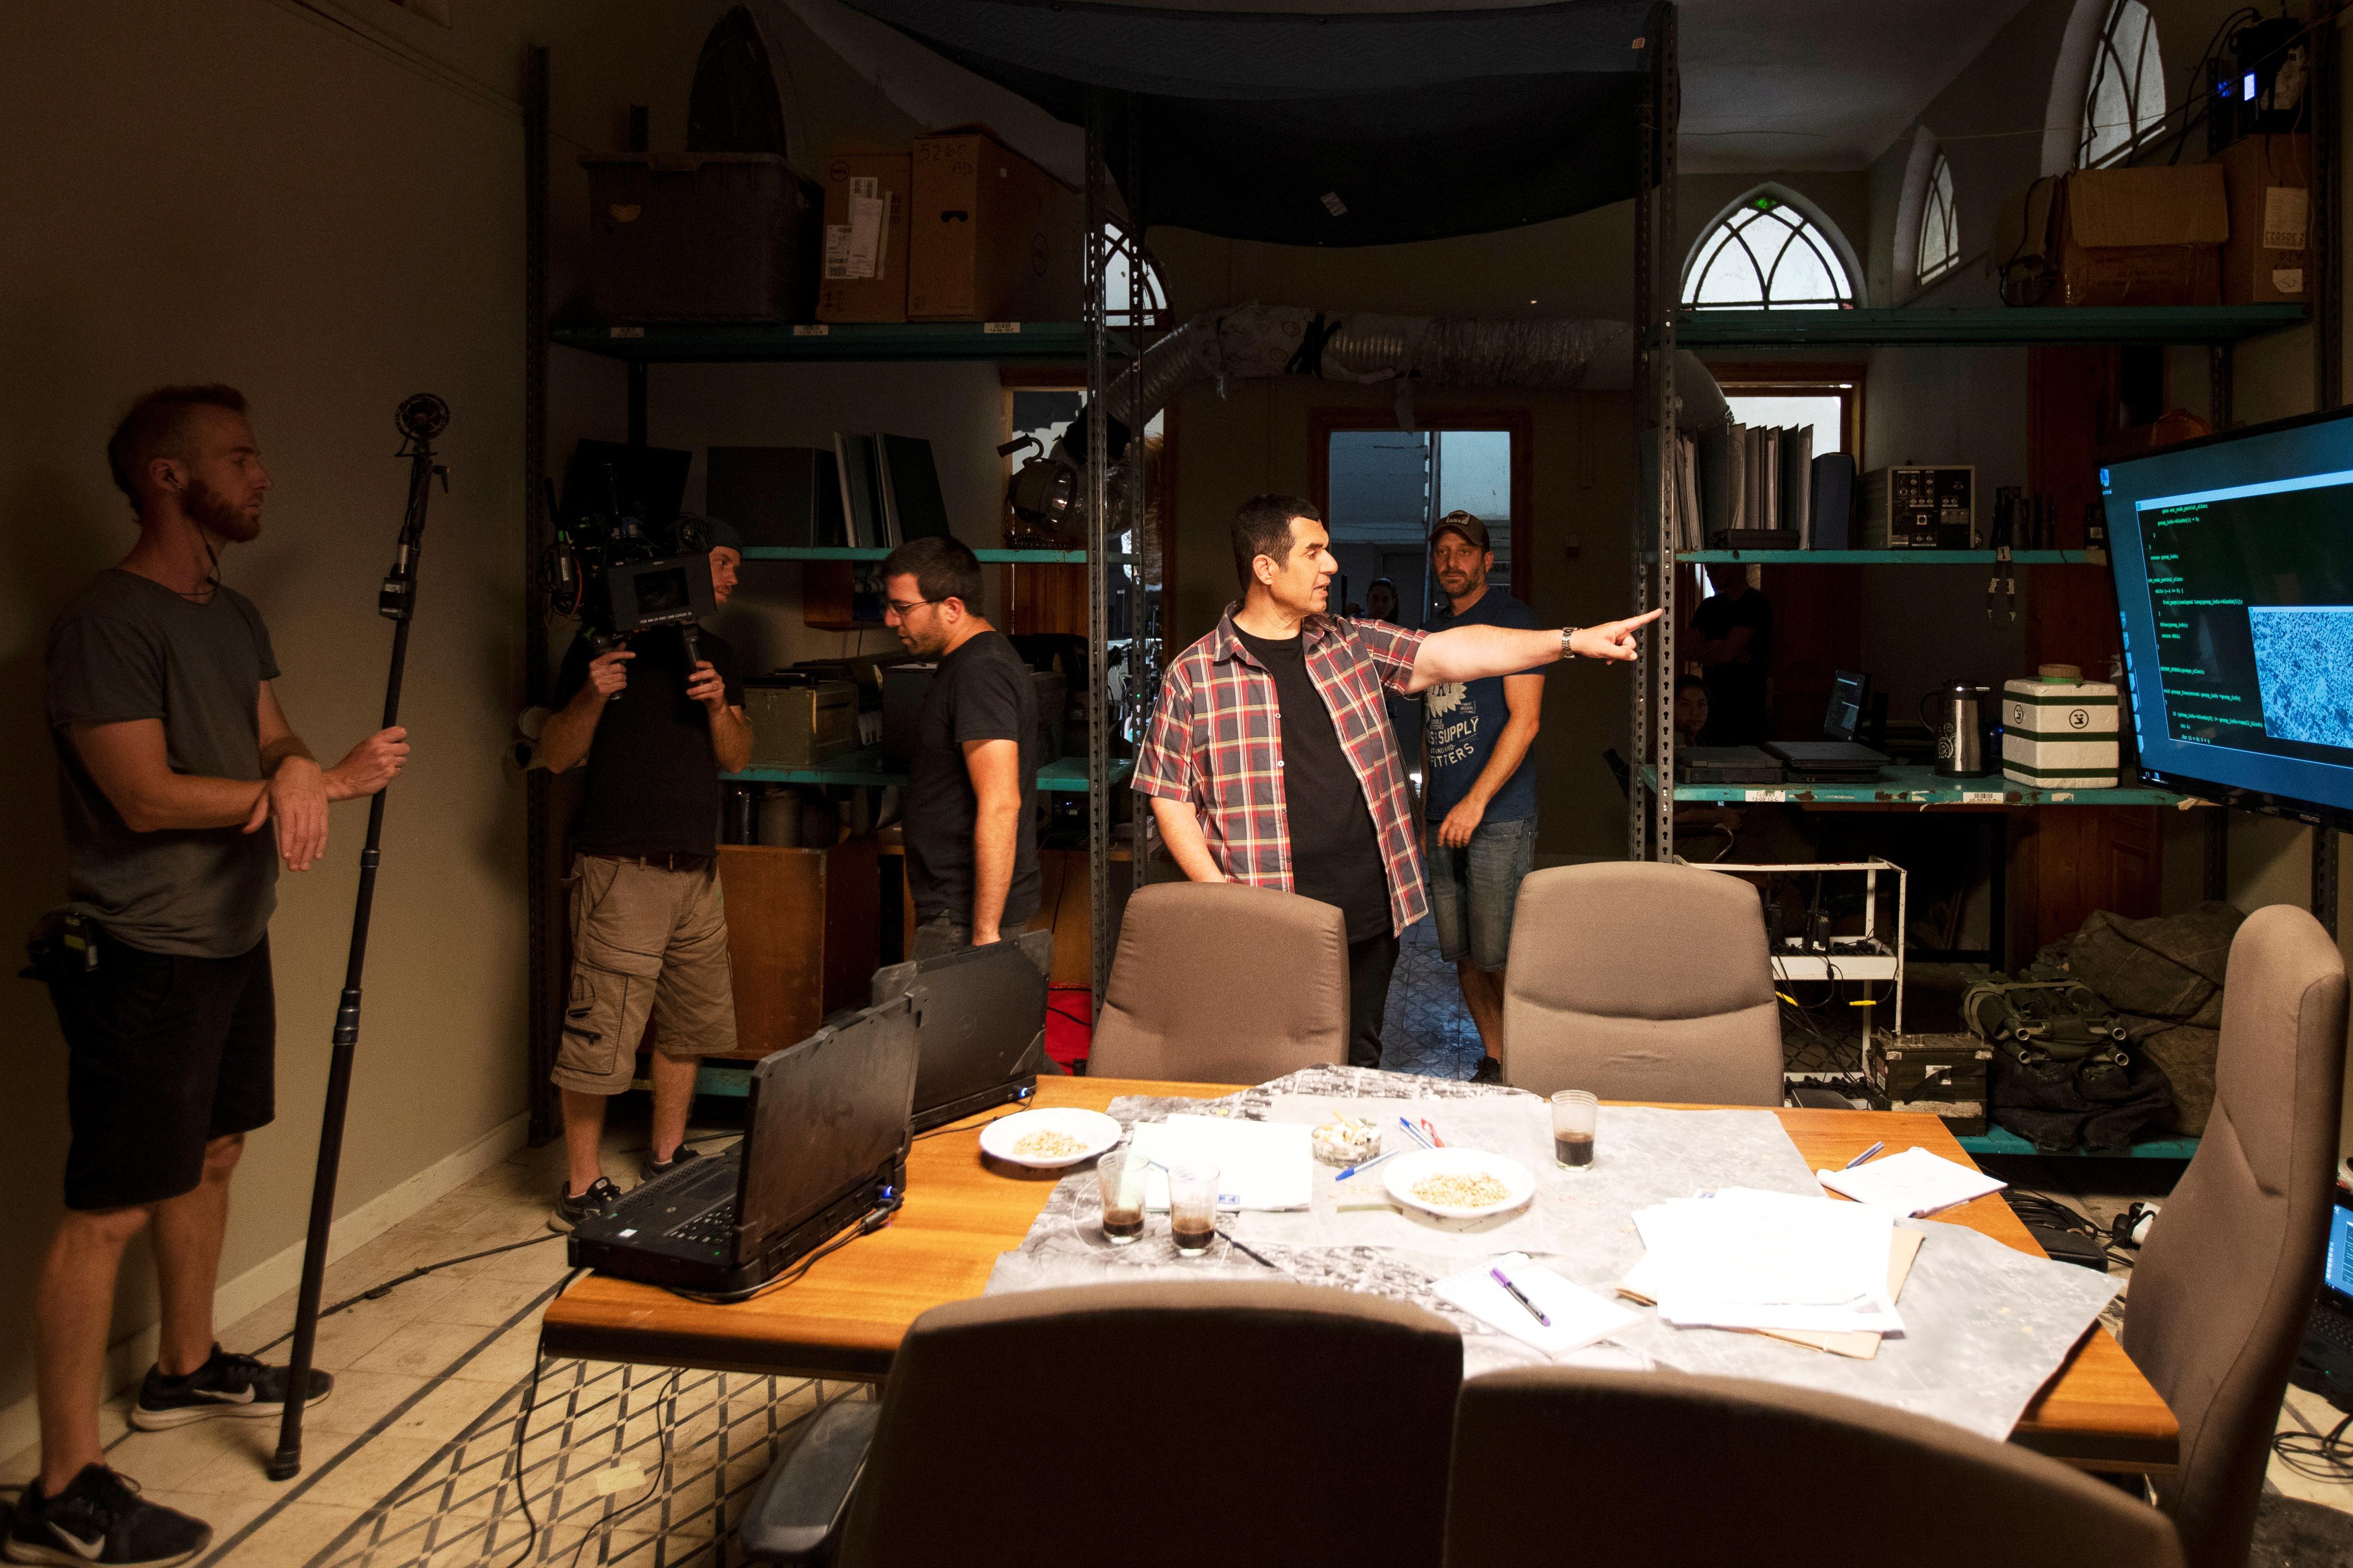 Israeli thriller series 'Fauda' digs in for darker third season